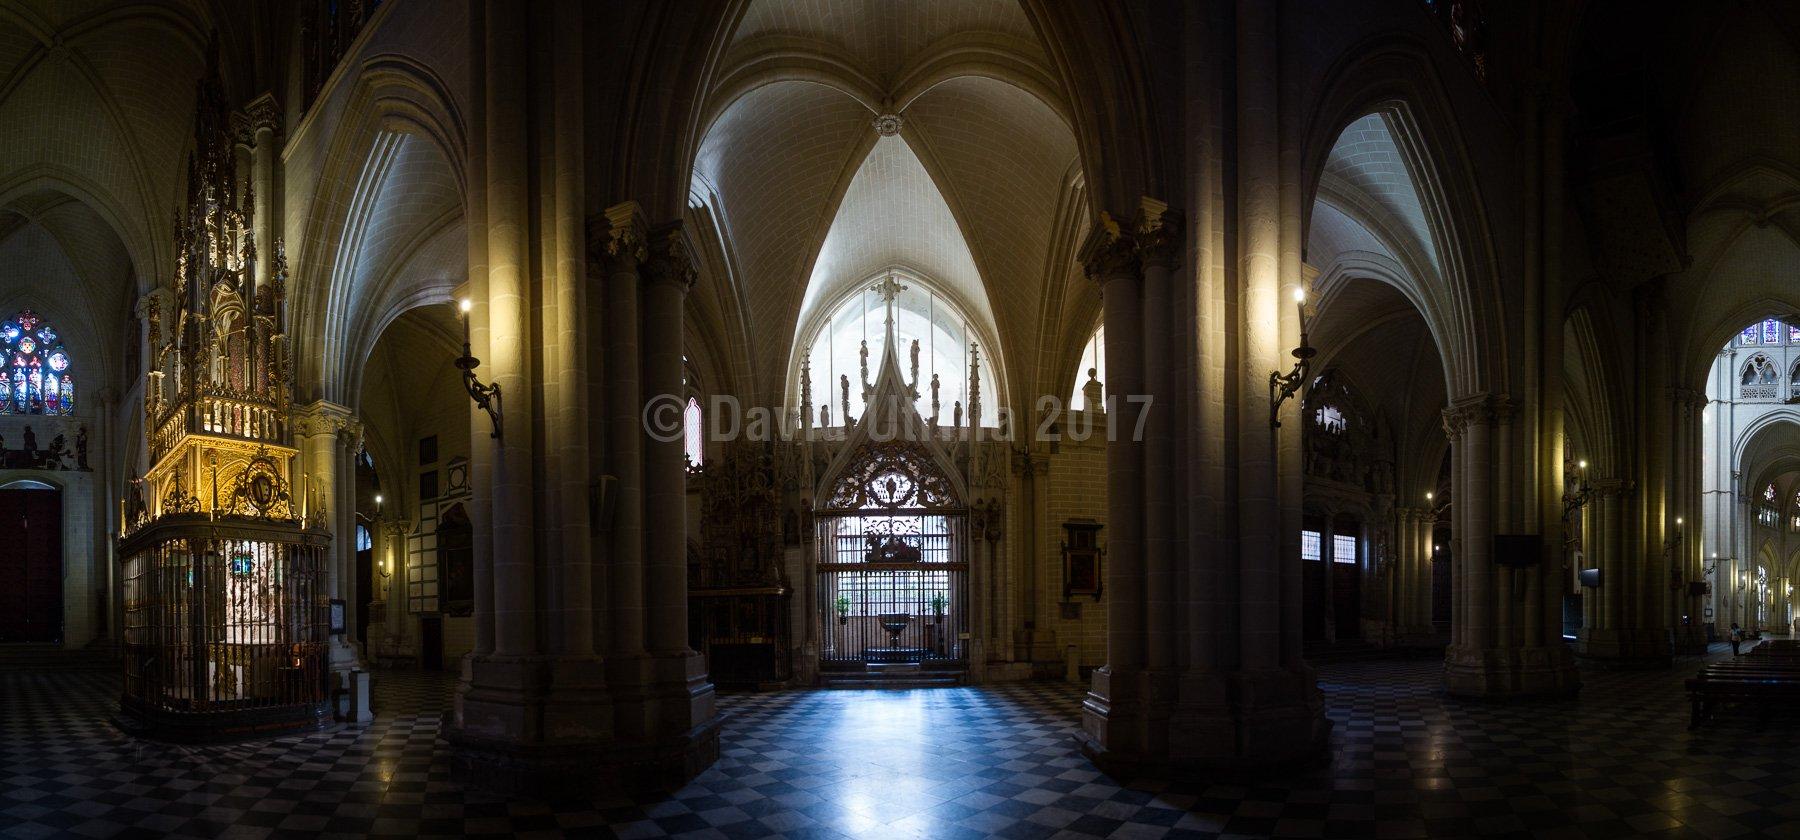 Panorámica interior de la Catedral de Toledo